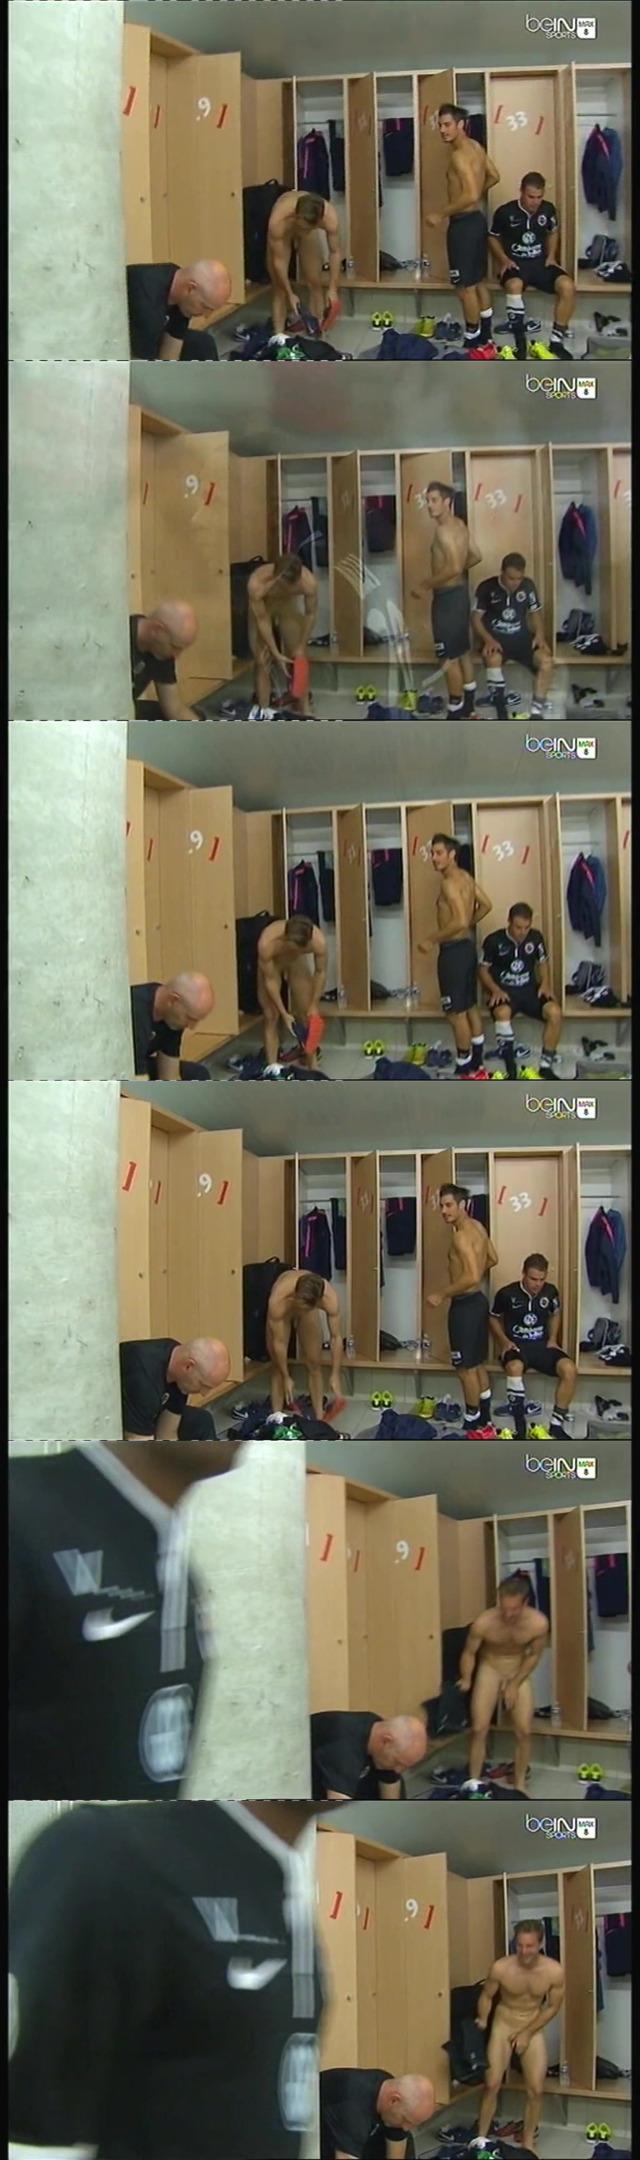 Footballer Damien Perquis accidental dick exposure